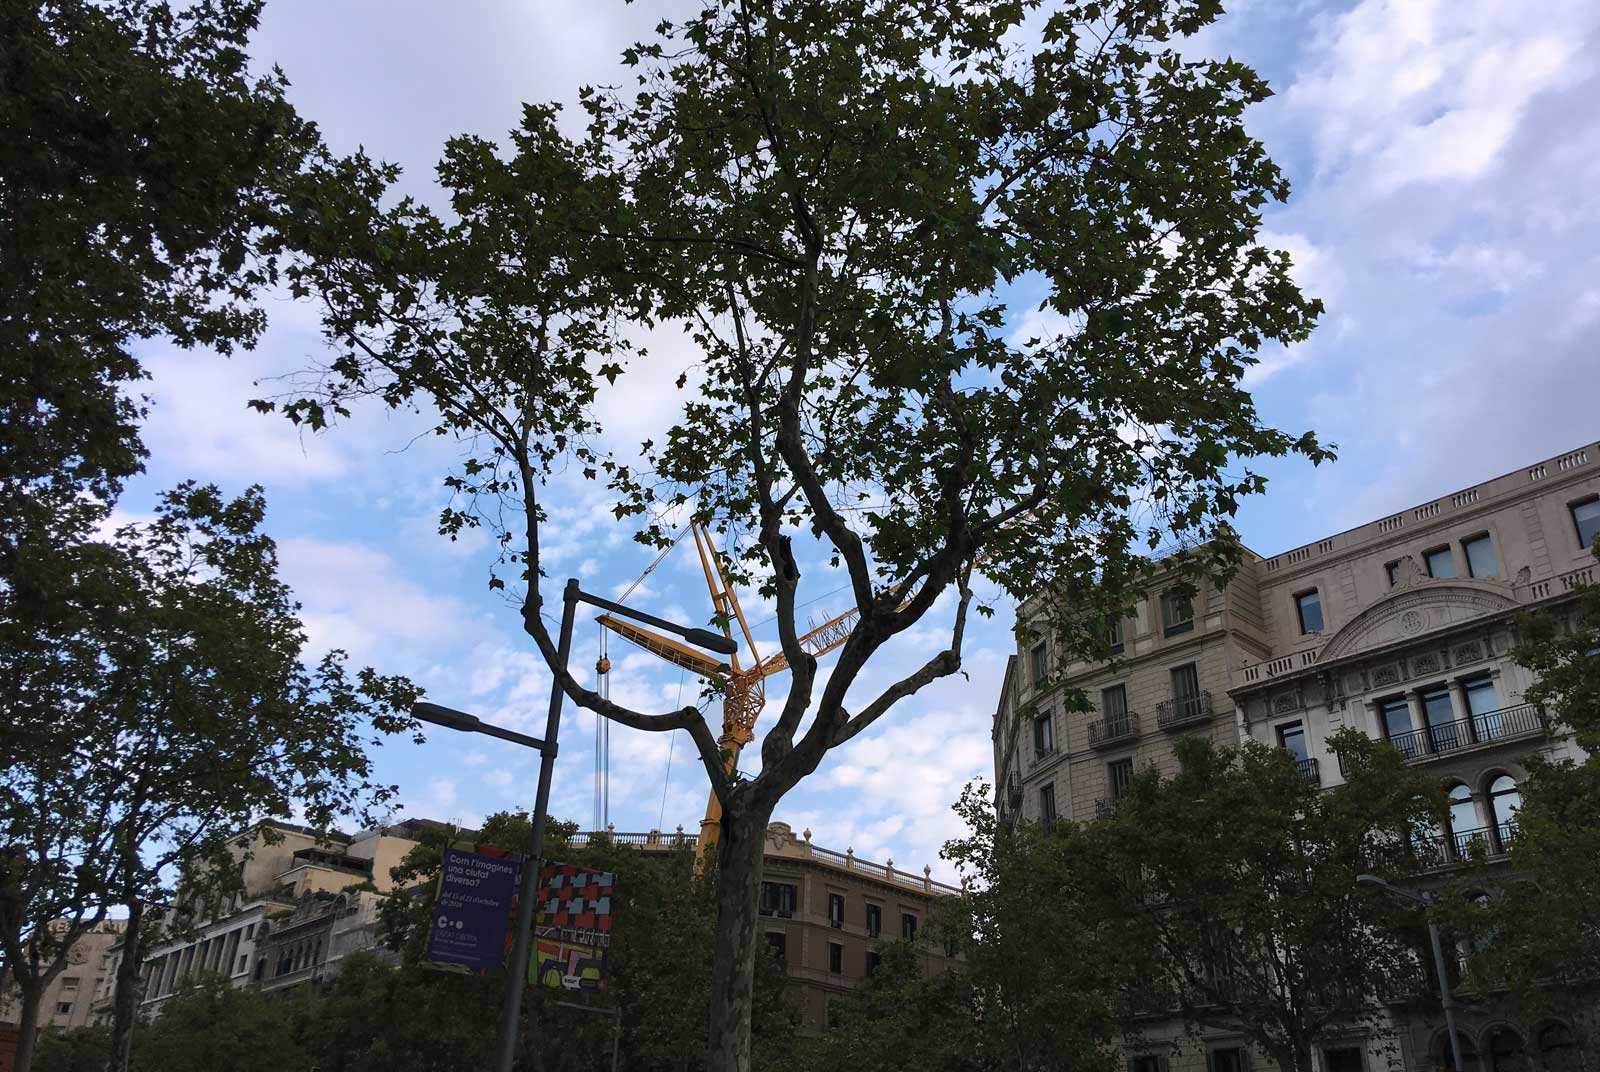 Árbol y grua en paralelo. Paseo de Gracia. Barcelona